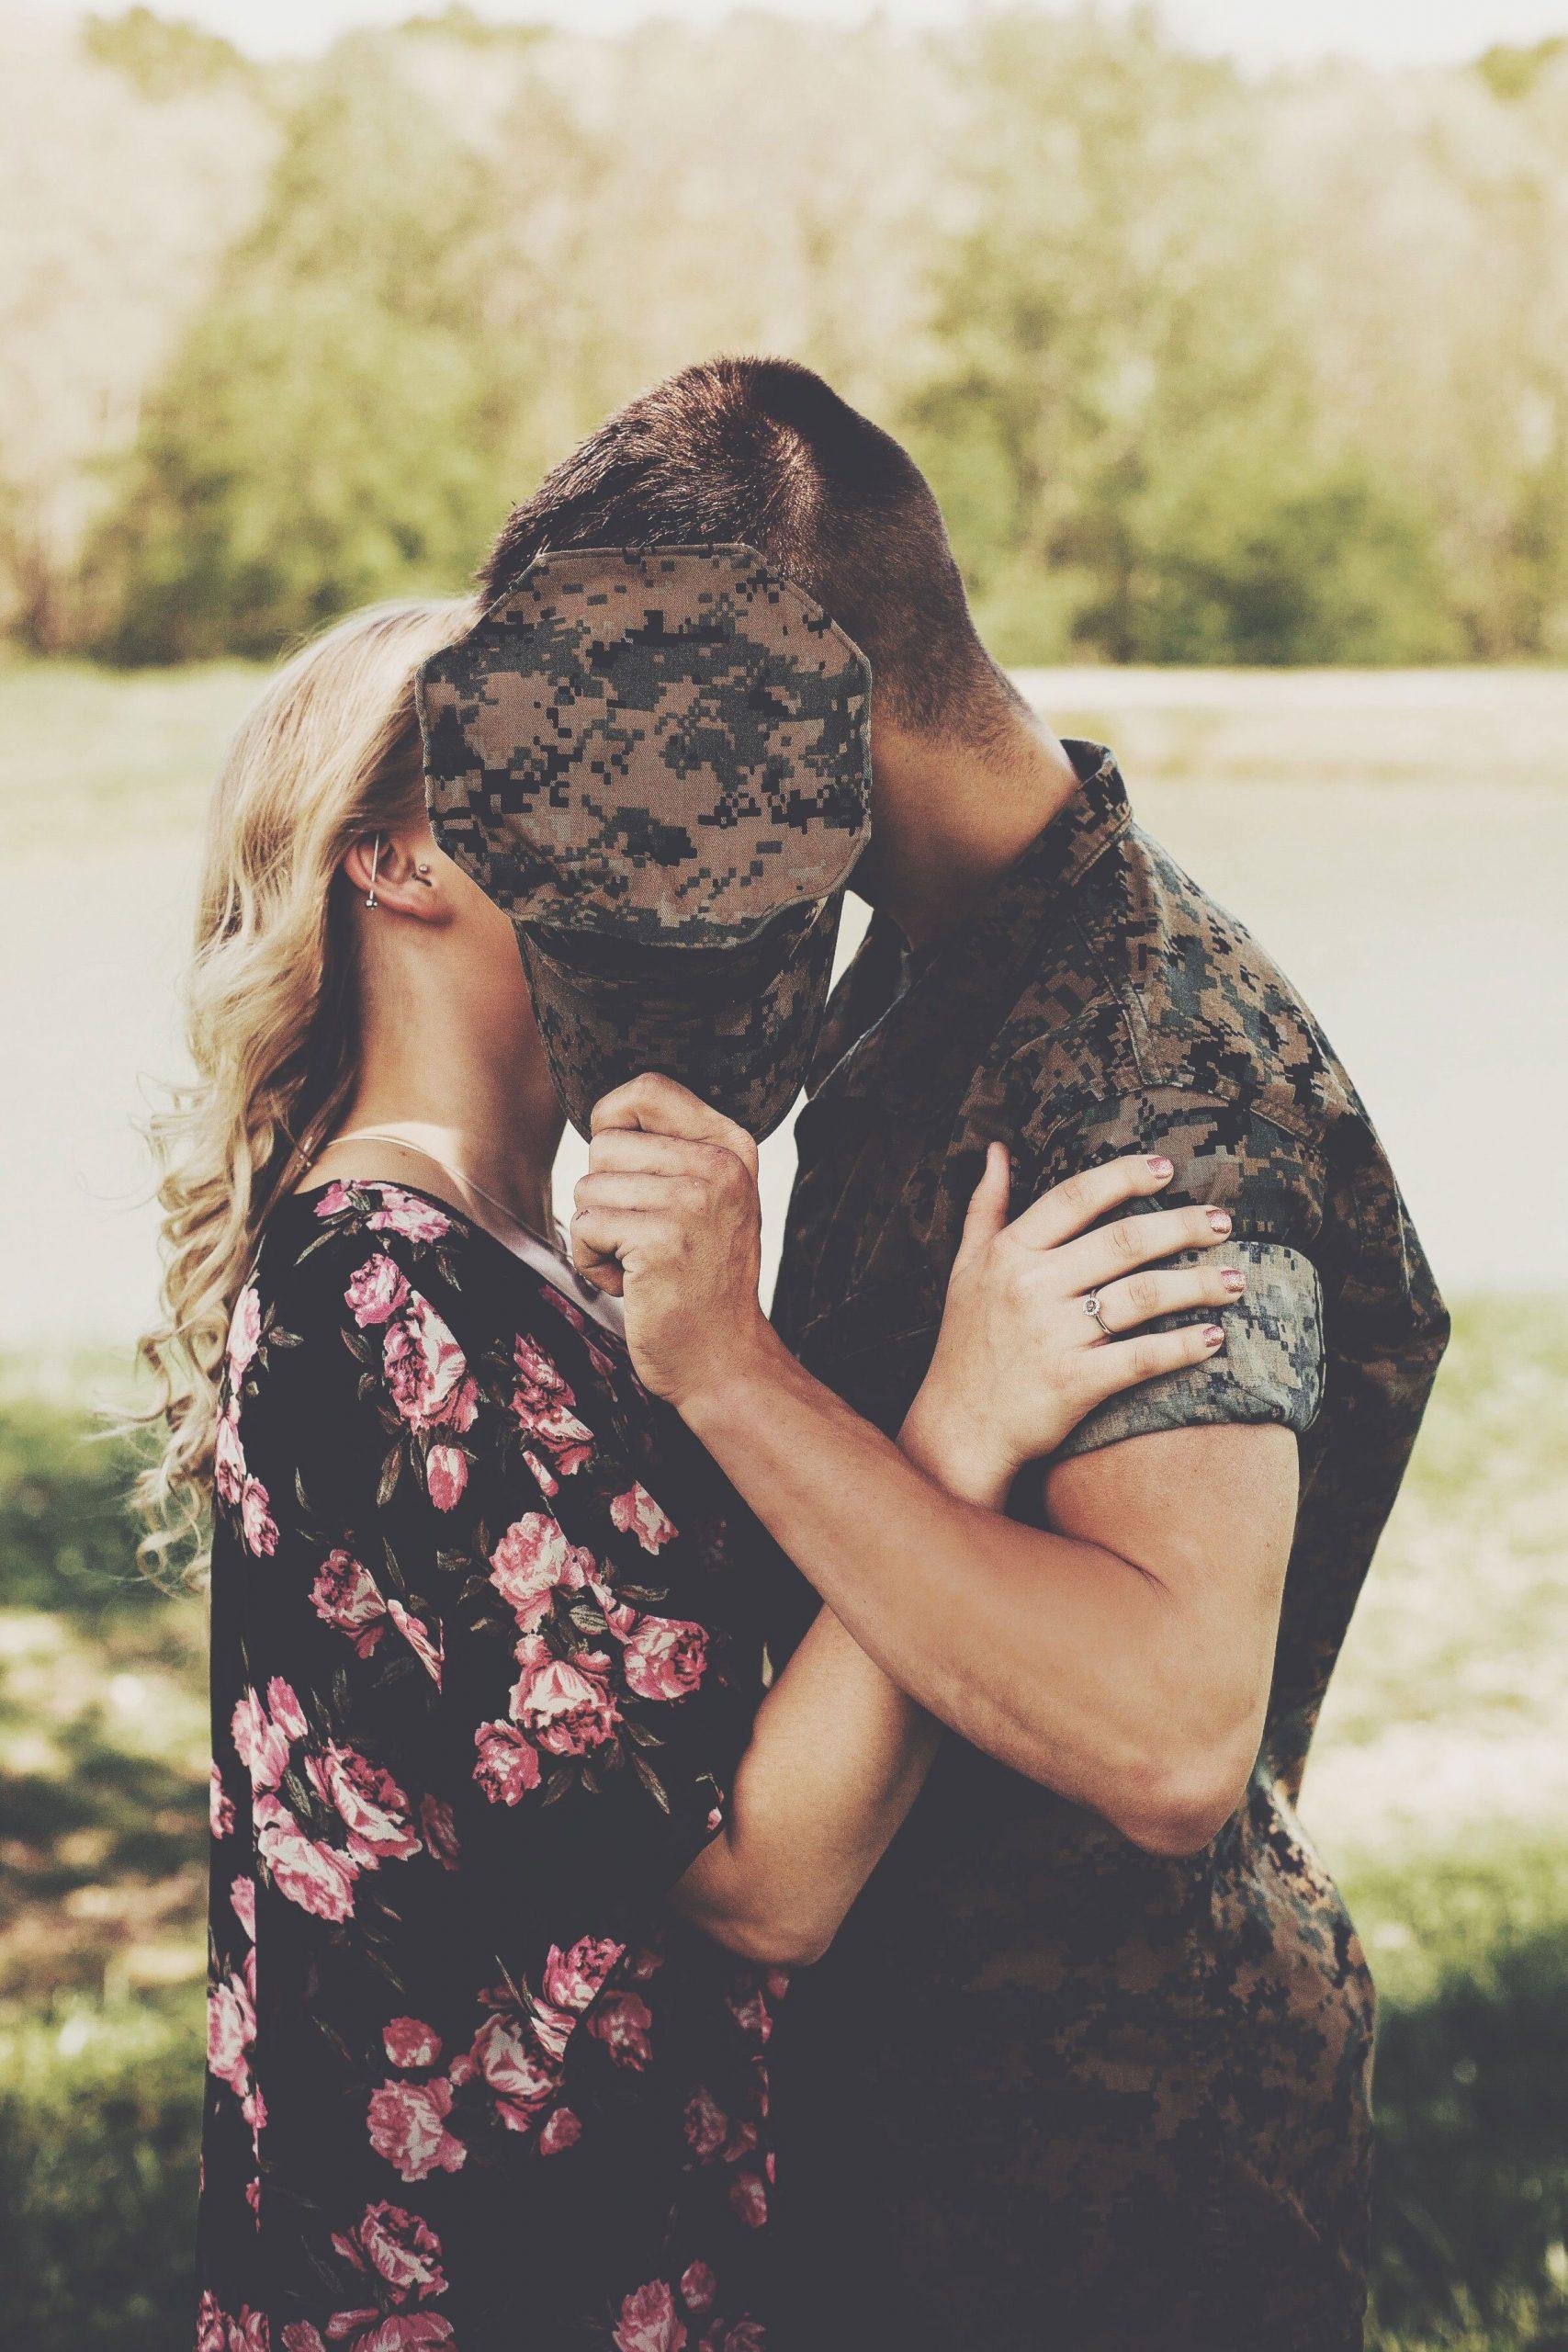 Cute Couple Images photo 2021